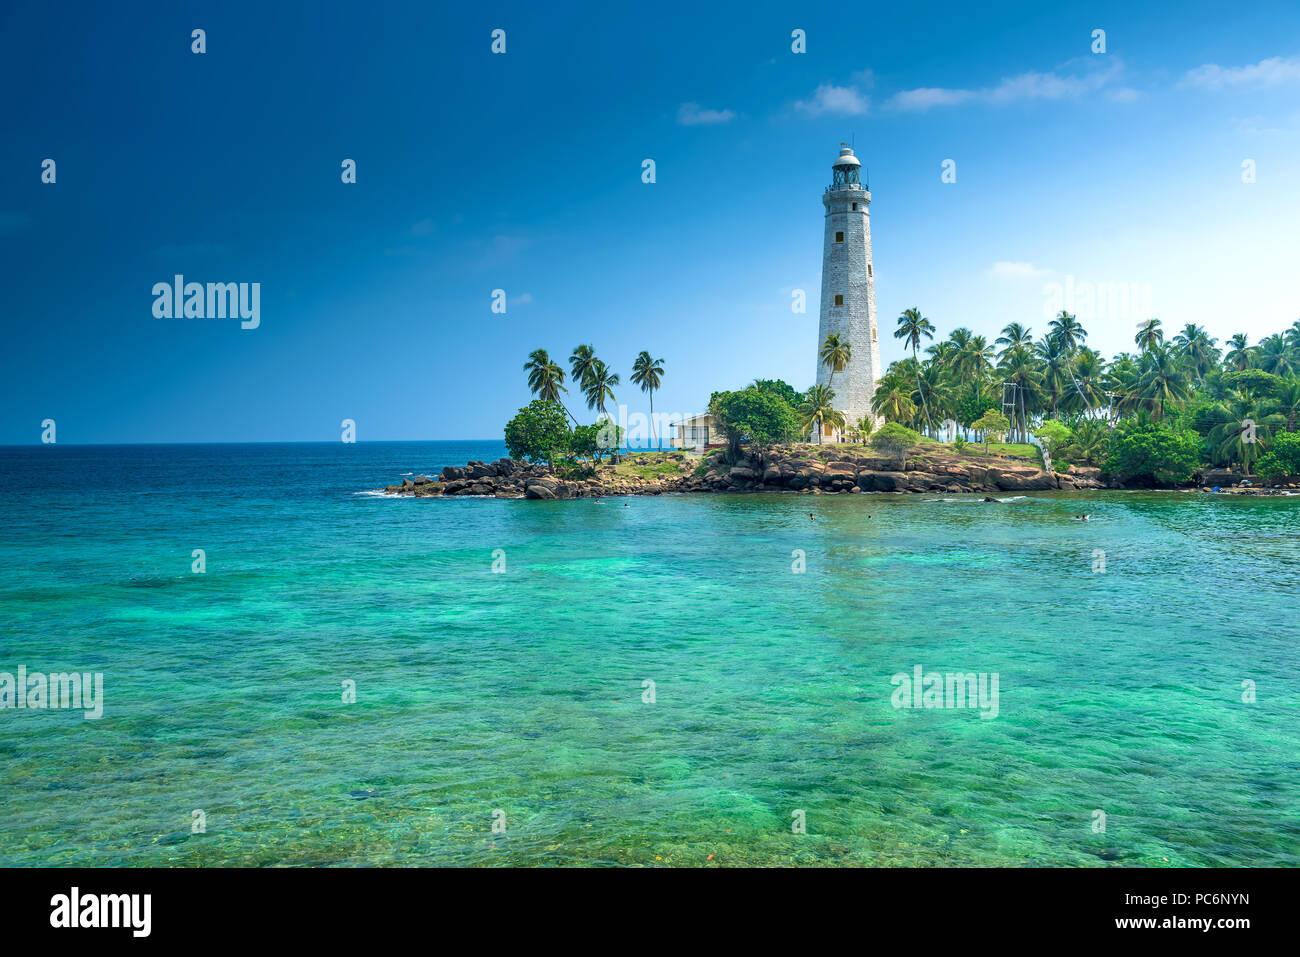 Dondara Light House, Matara, Sri Lanka Stock Photo